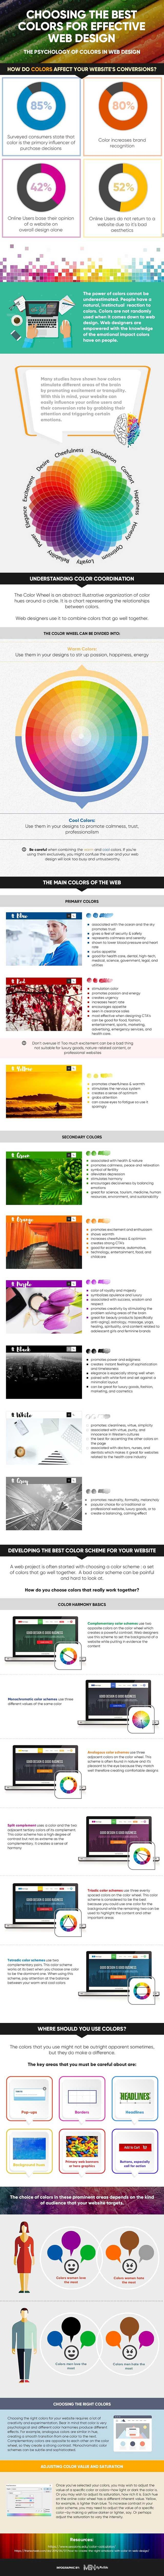 Psychology-of-Color-on-Website-Design-Infographic